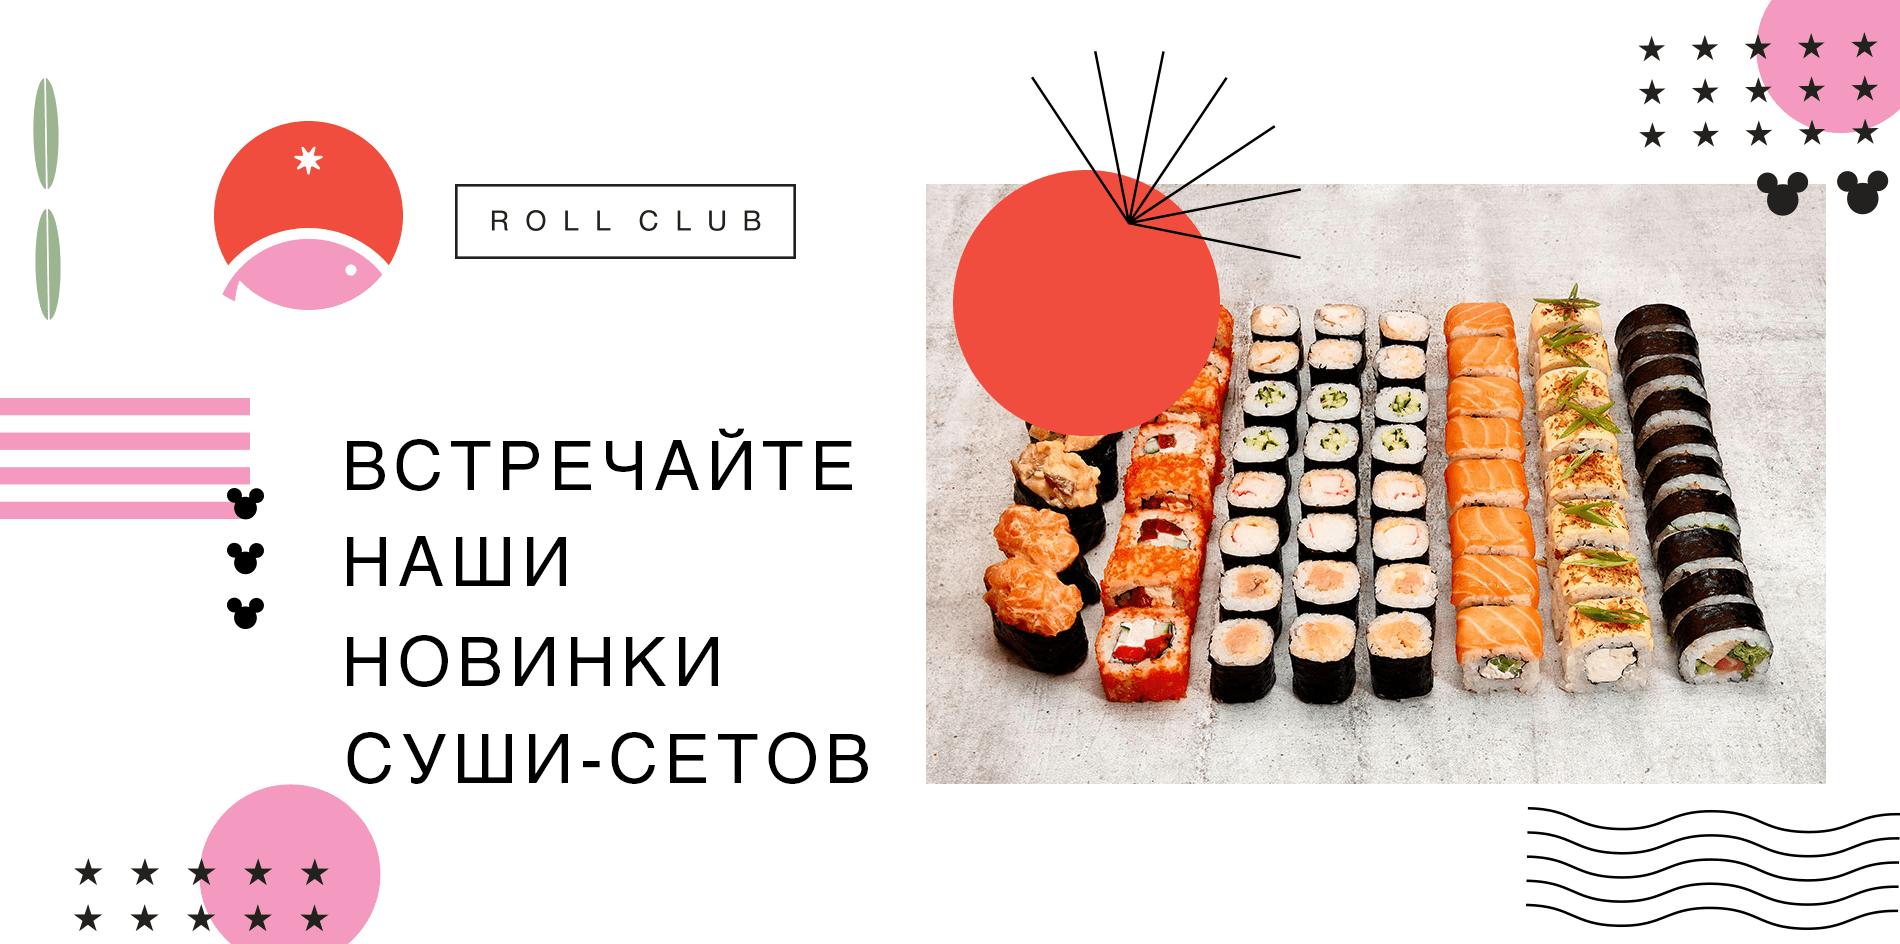 Встречайте наши новинки суши-сетов